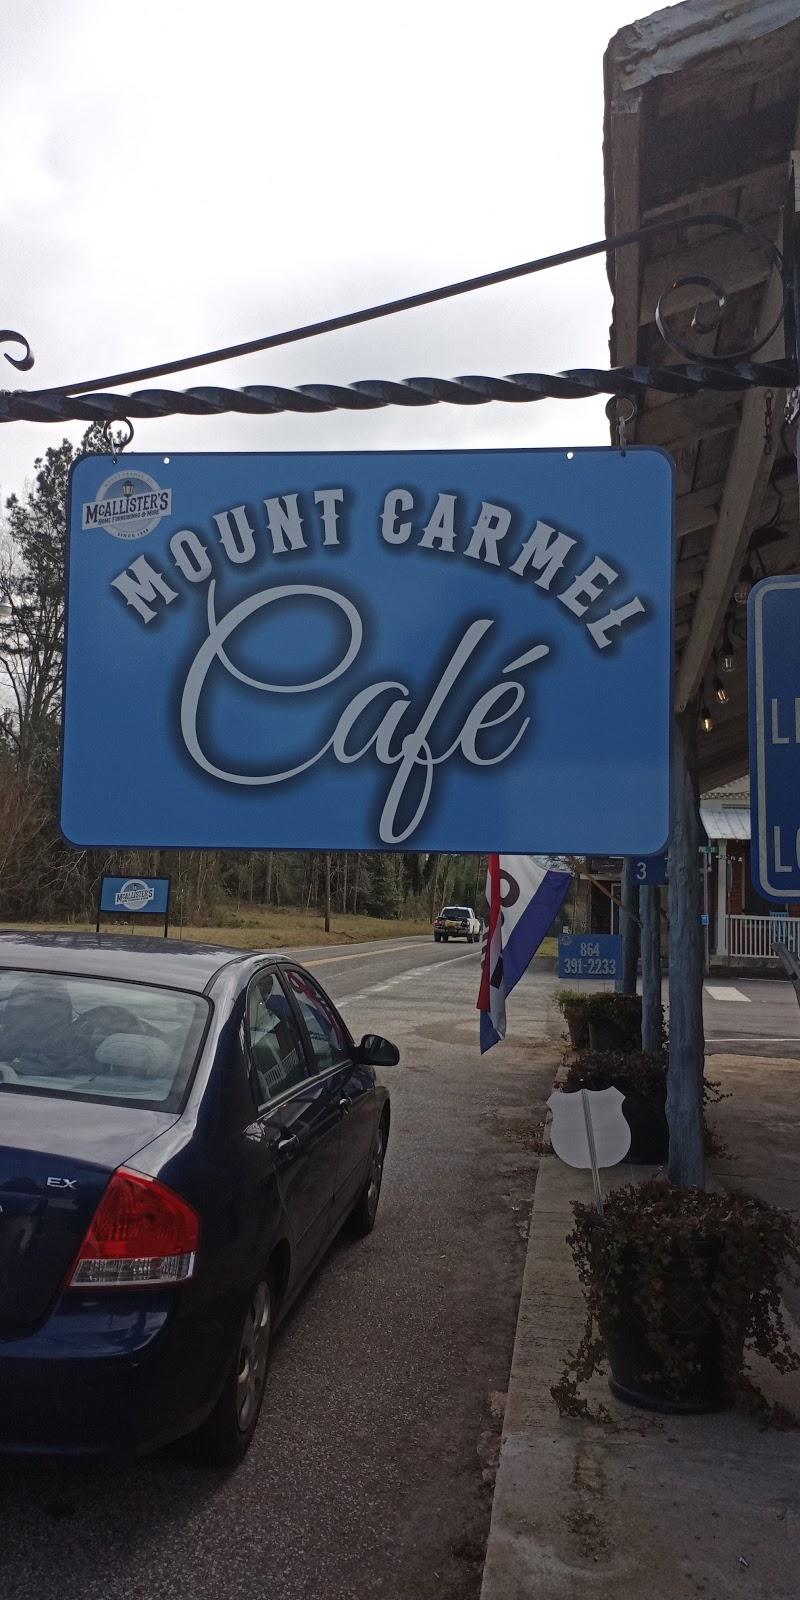 Mount Carmel Café | restaurant | 3883 Main St, Mt Carmel, SC 29840, USA